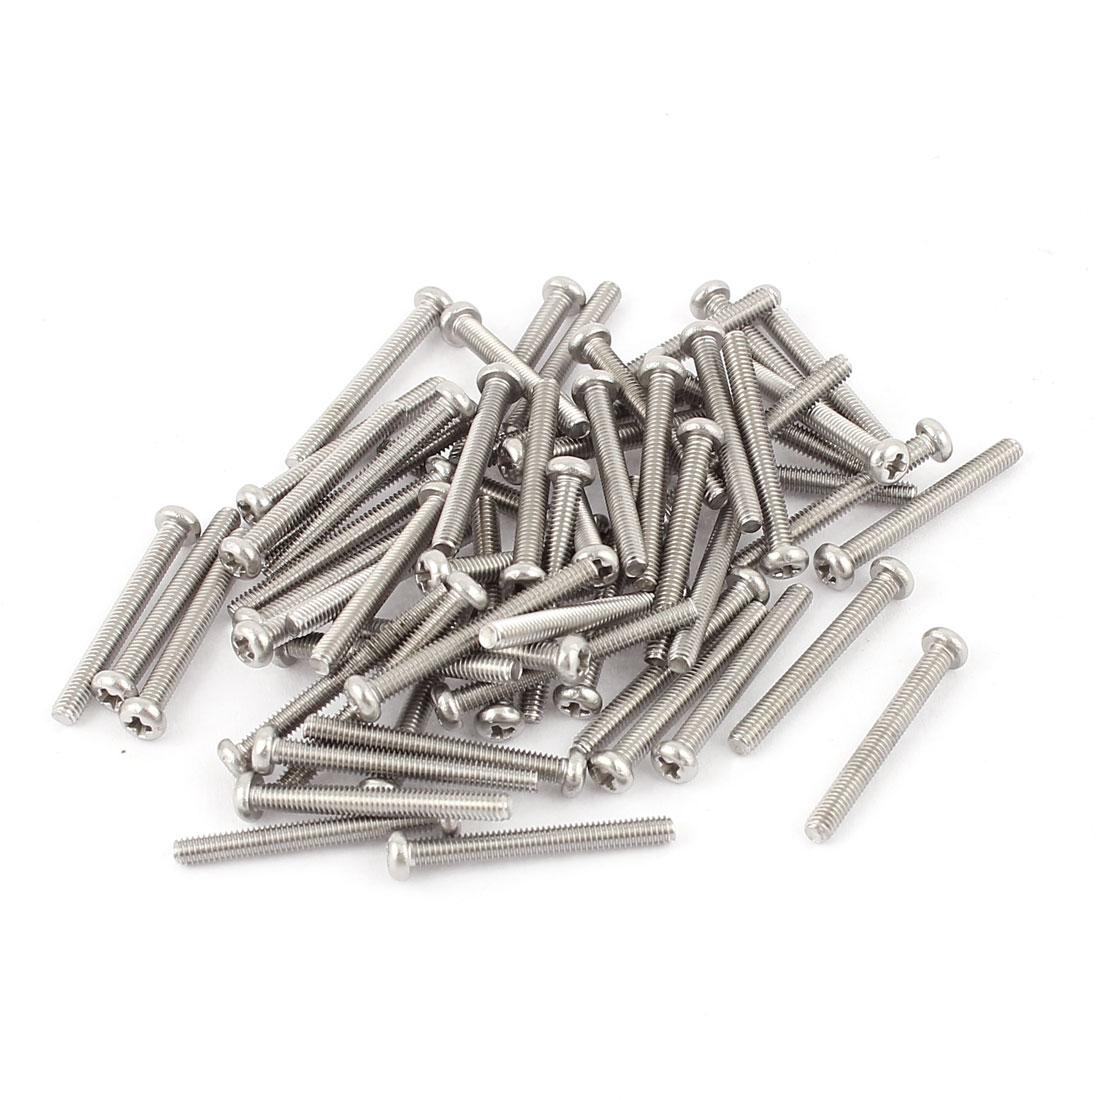 60pcs 304 Stainless Steel Crosshead Phillips Pan Head Screws Bolt M2.5 x 22mm